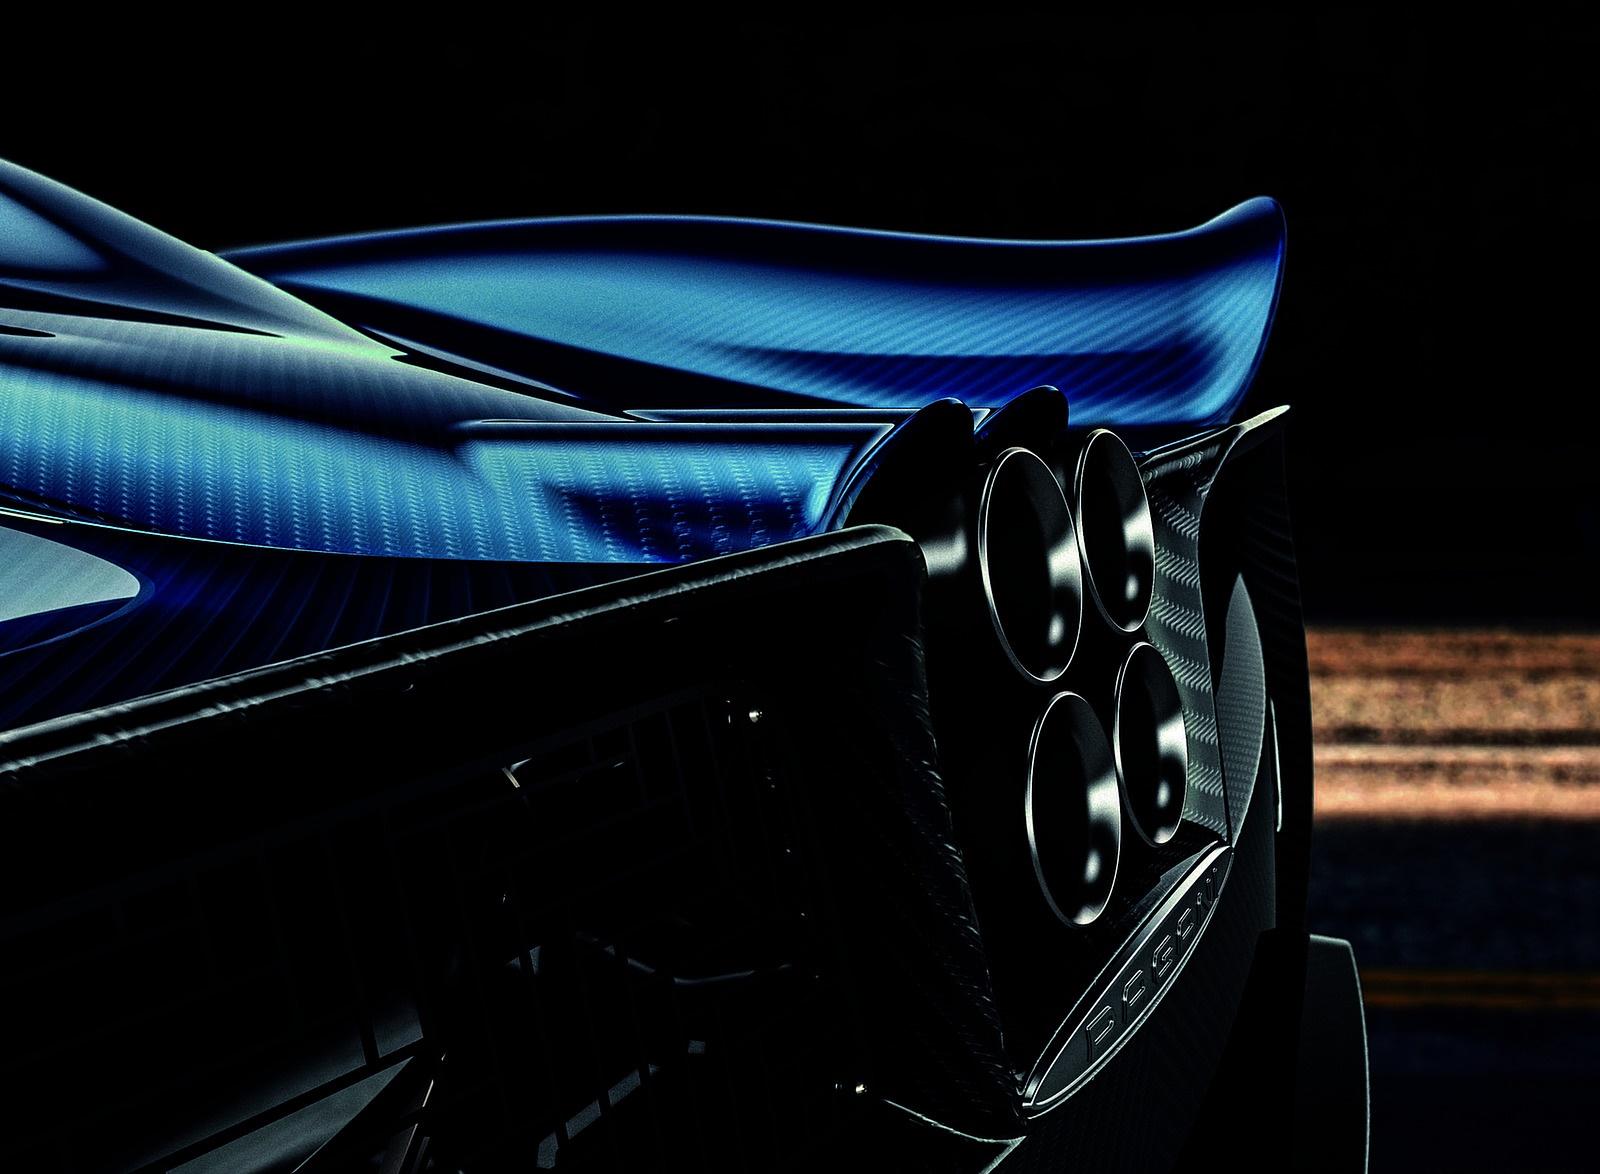 2018 Pagani Huayra Roadster Tailpipe Wallpapers (9)